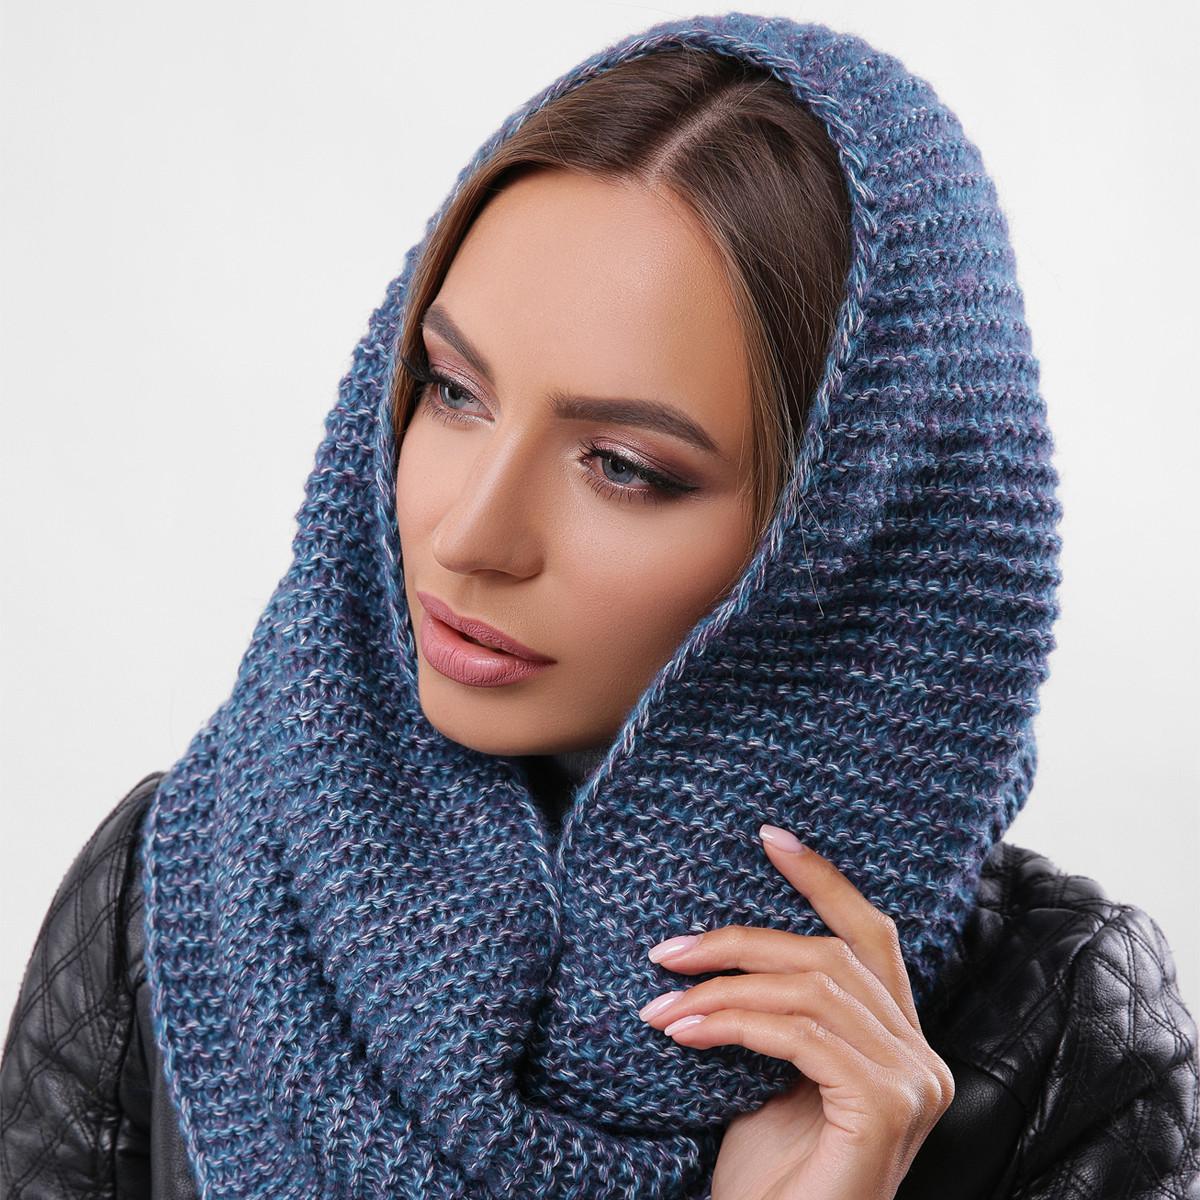 Модный молодежный вязаный снуд, шарф-хомут